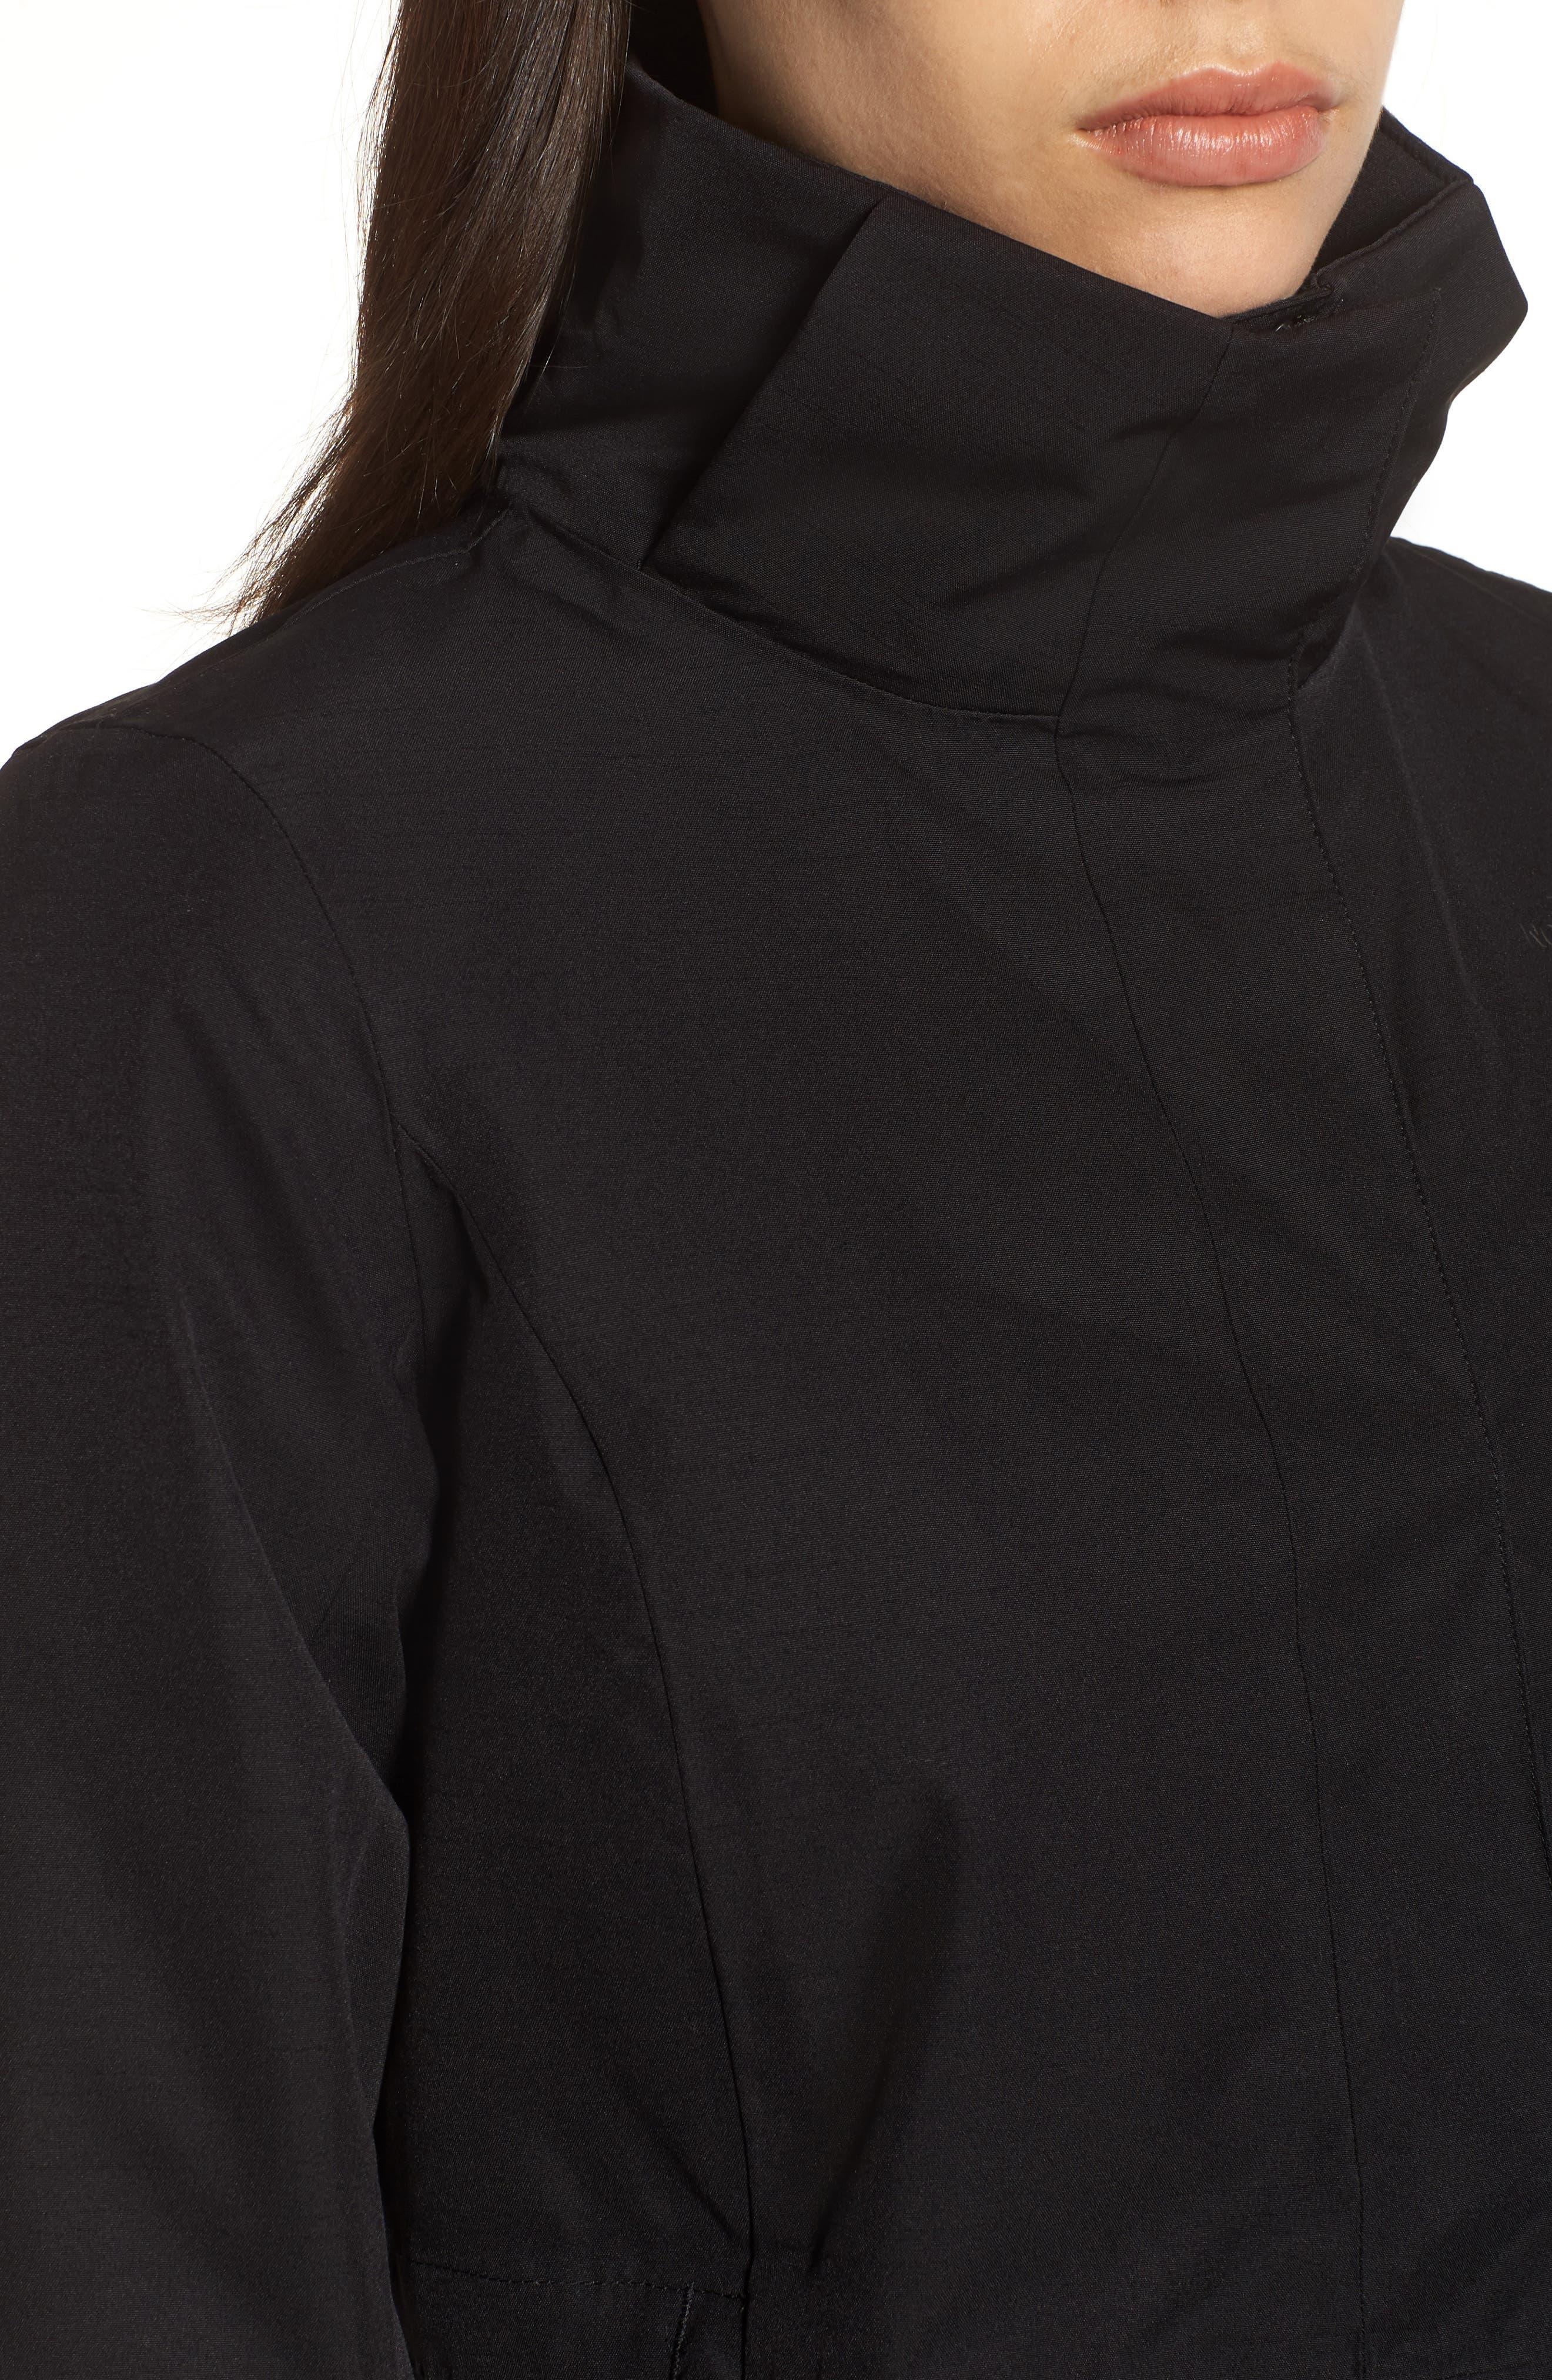 Ancha II Hooded Waterproof Parka,                             Alternate thumbnail 4, color,                             Black